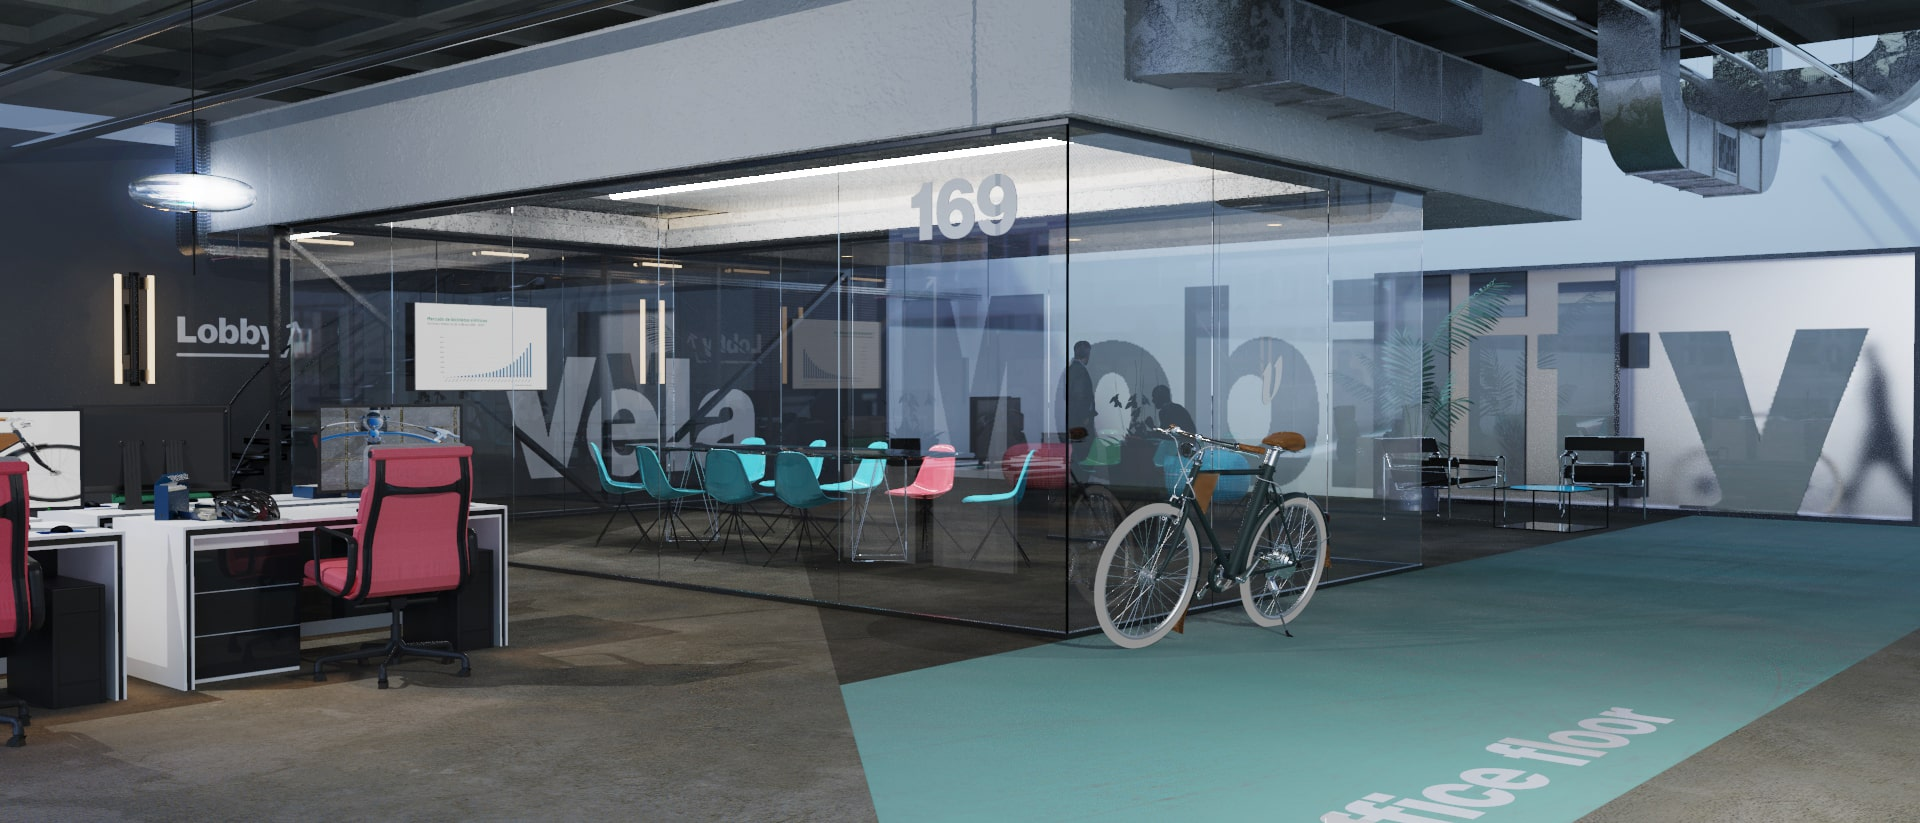 Investir - Vela Bikes